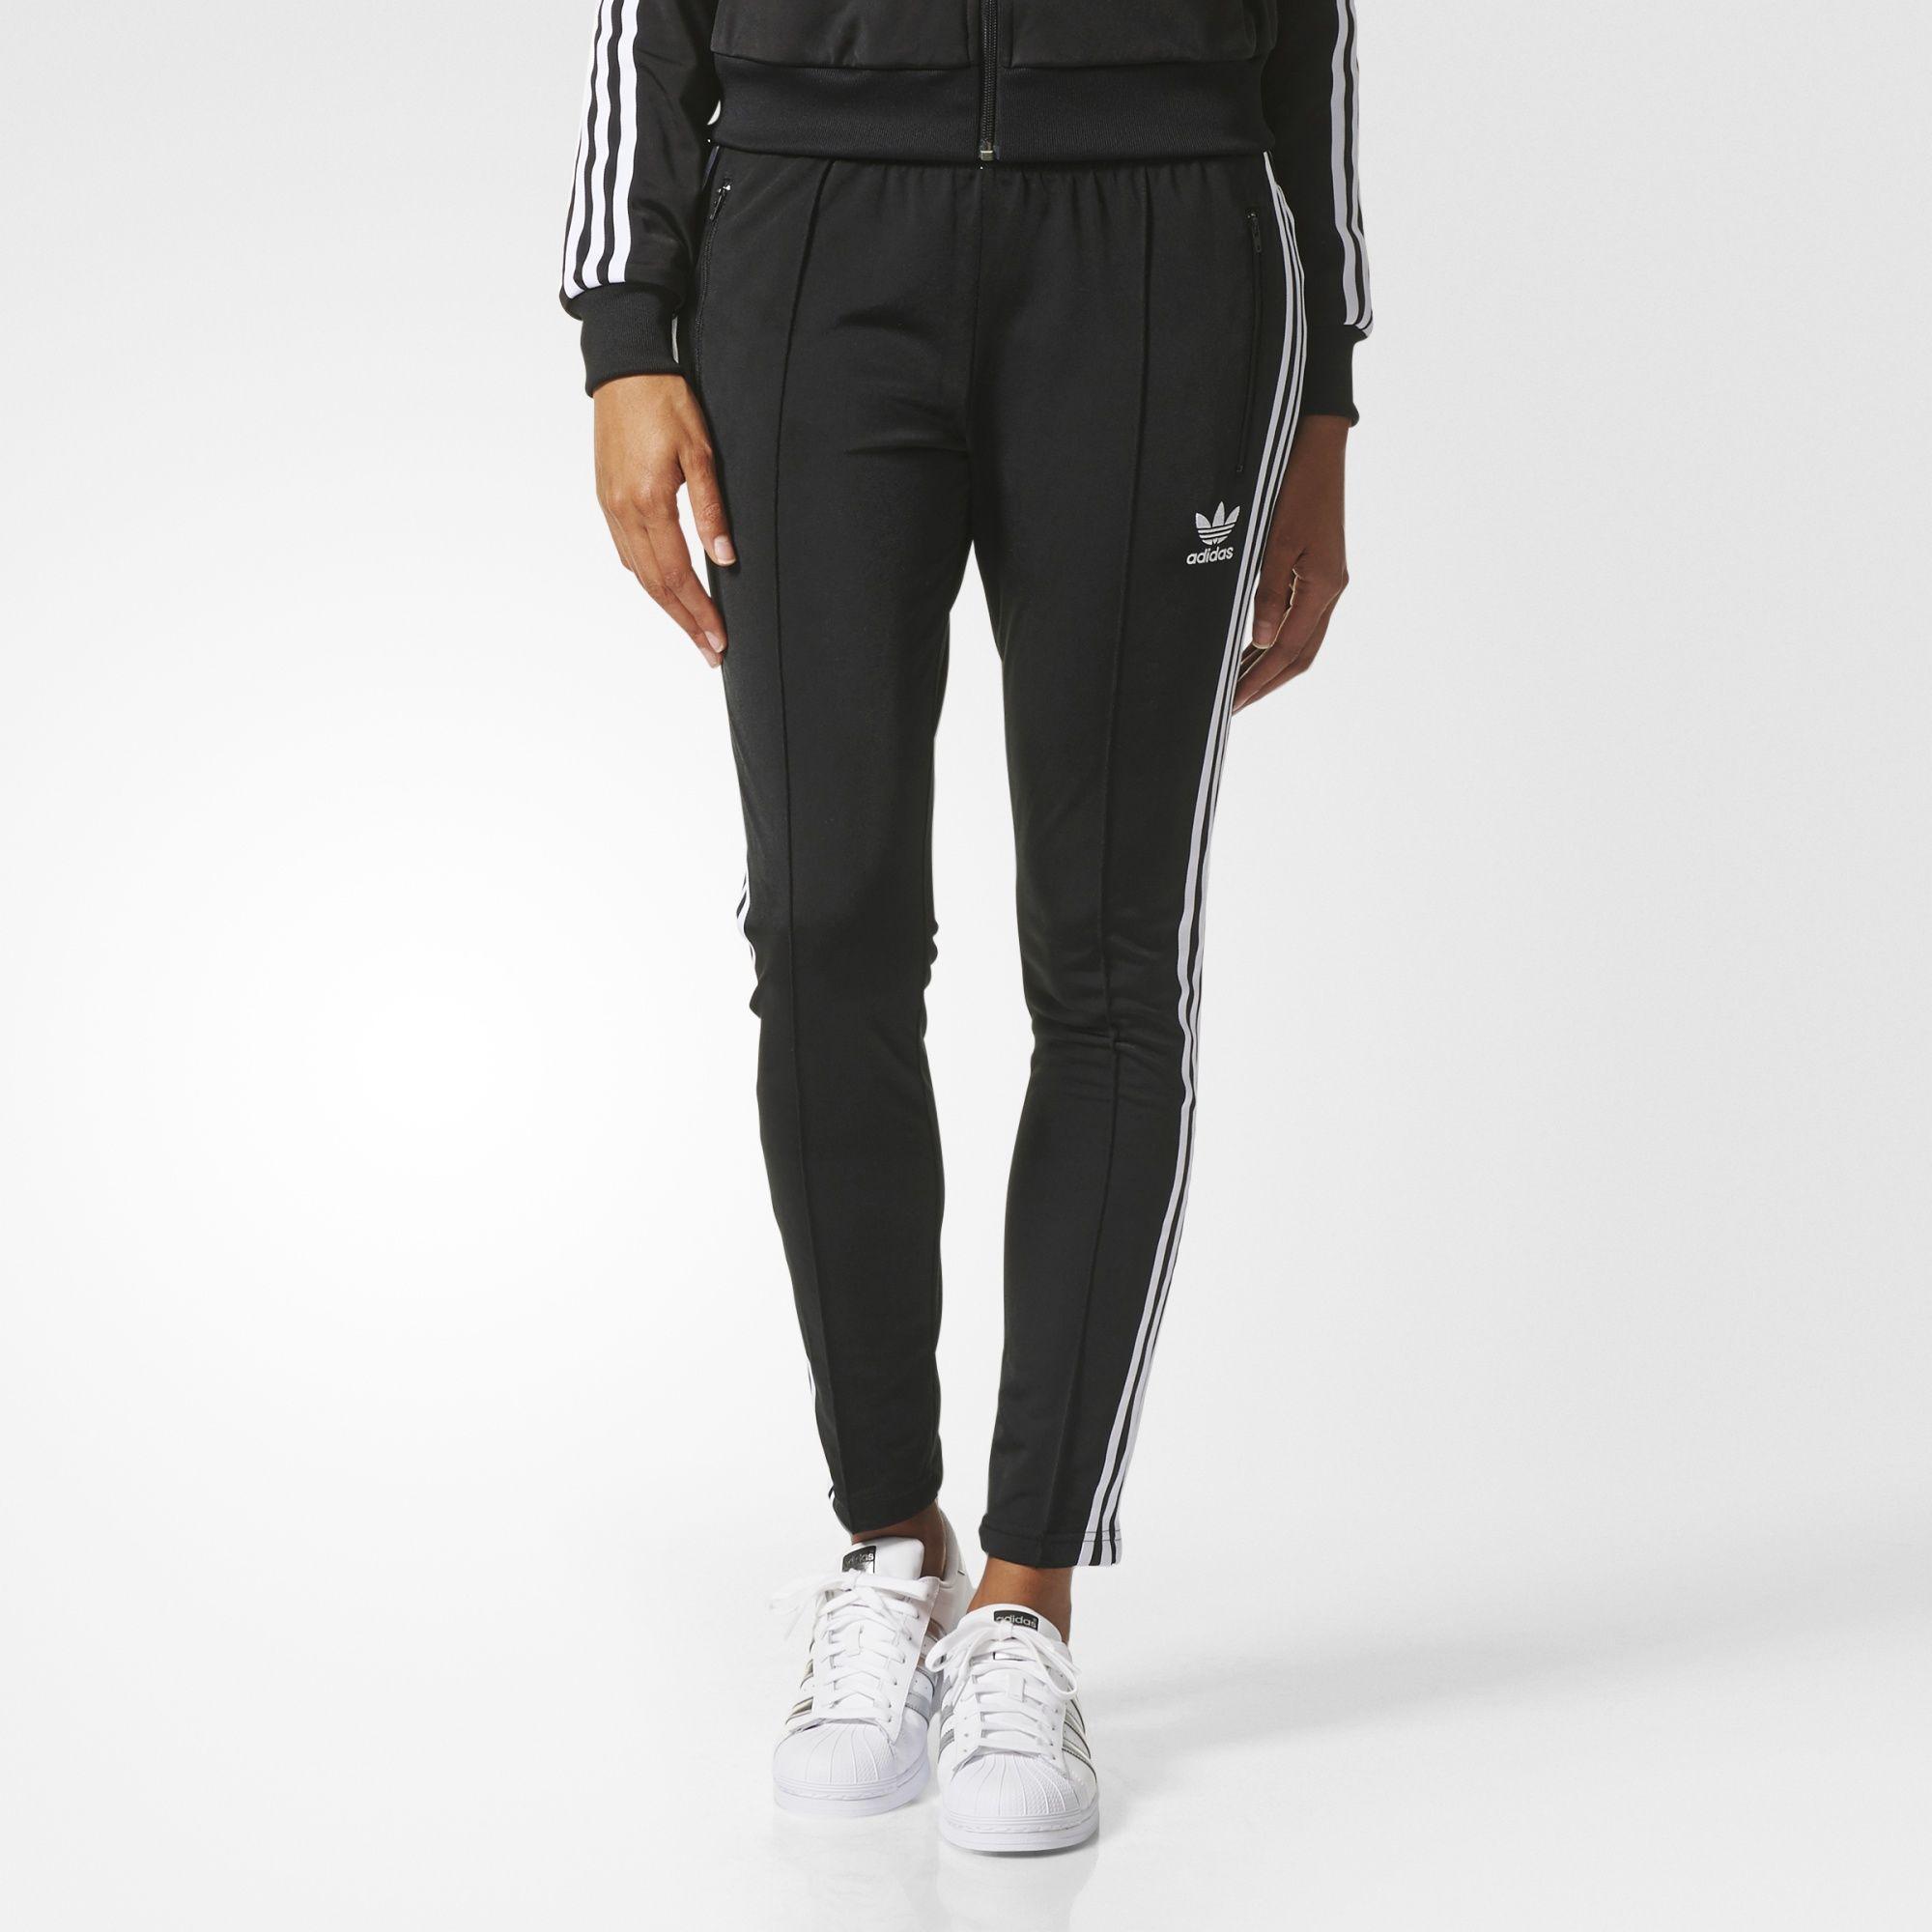 adidas Women's SST Track Pants | Kleding Broeken, Adidas